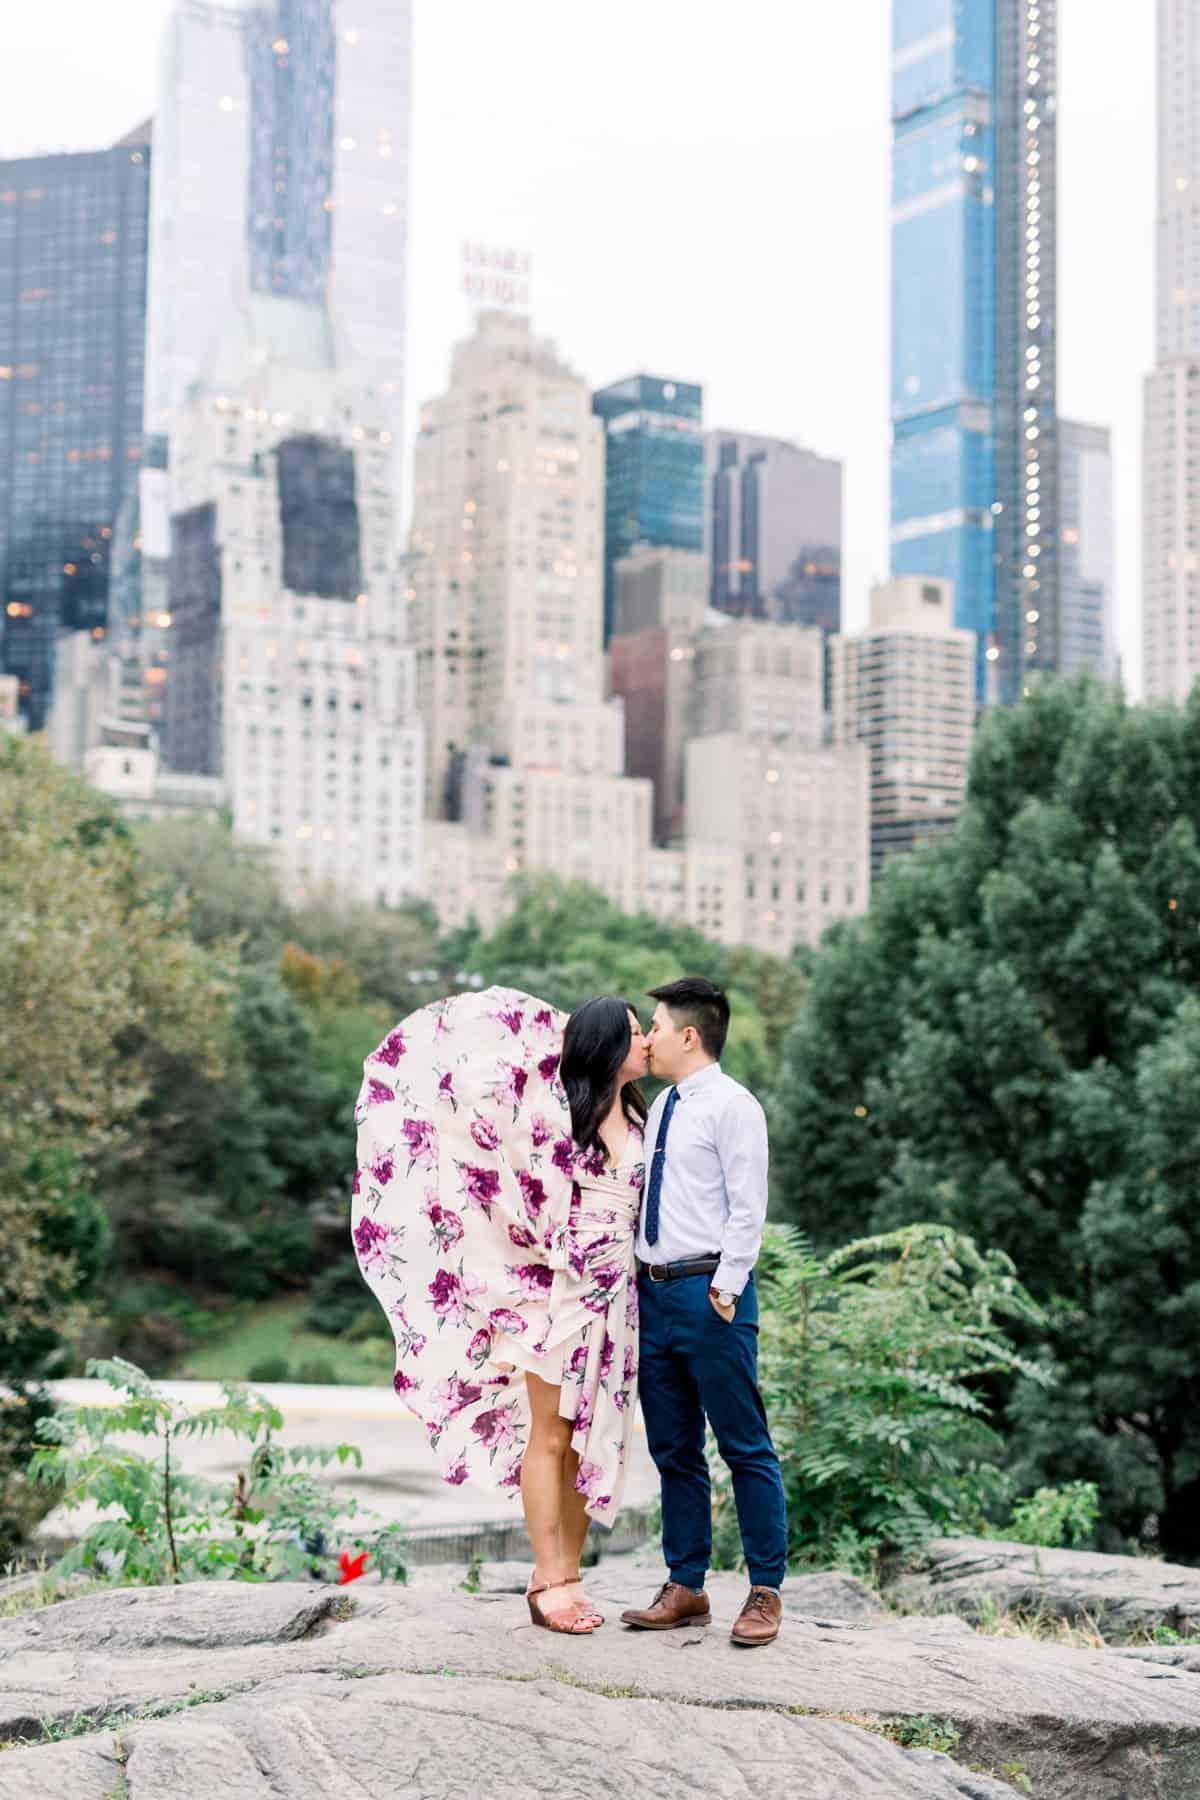 New York City Central Park Engagement Session, Umpire Rocks, The Rocks